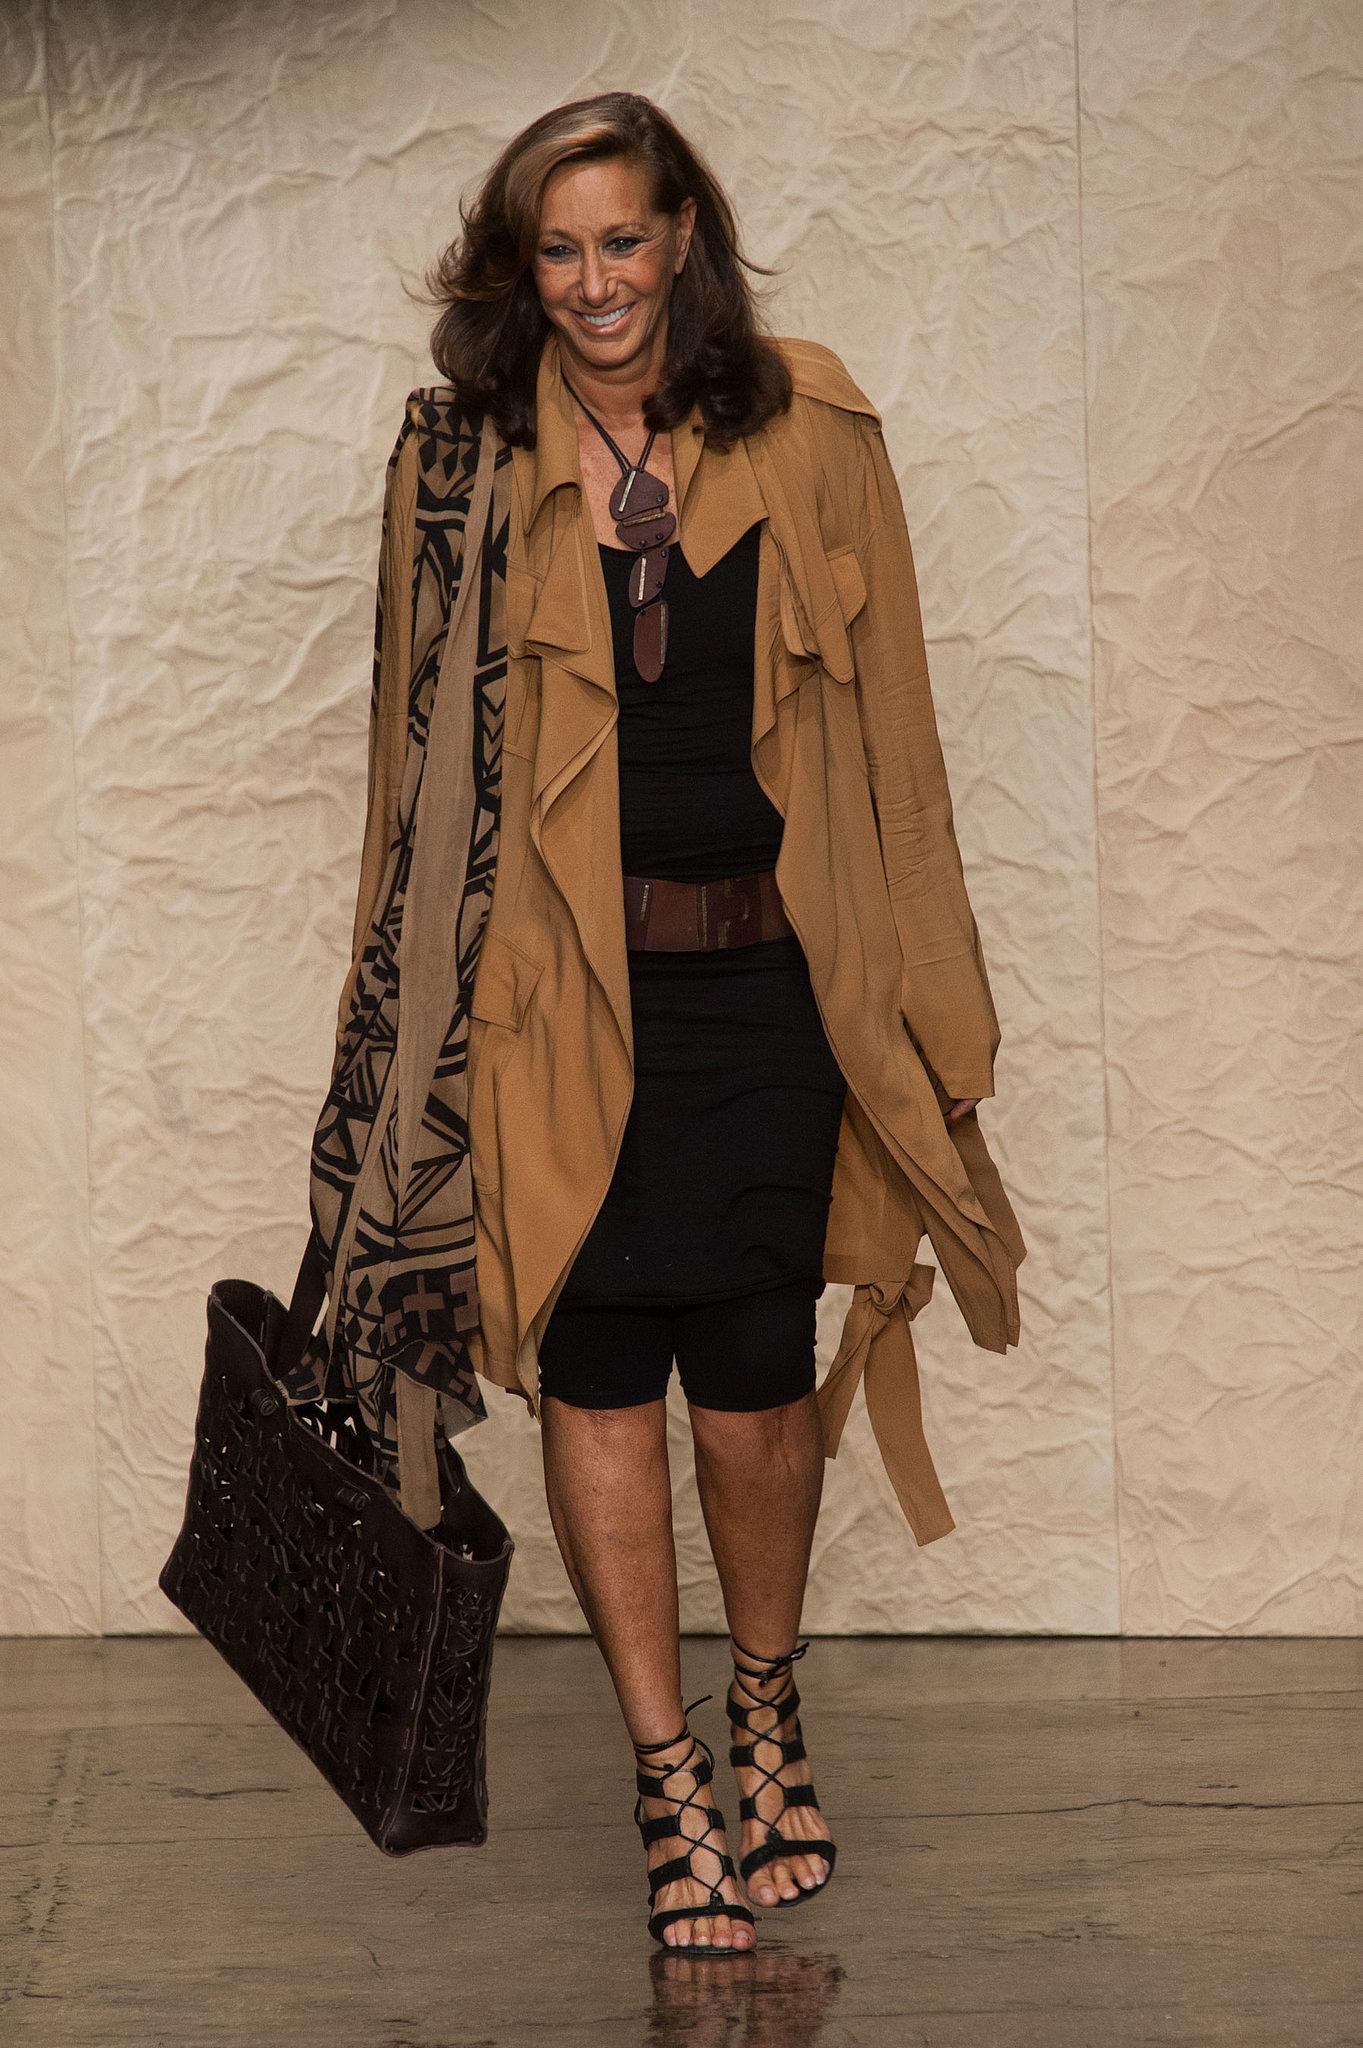 Donna Karan NY Spring 2014